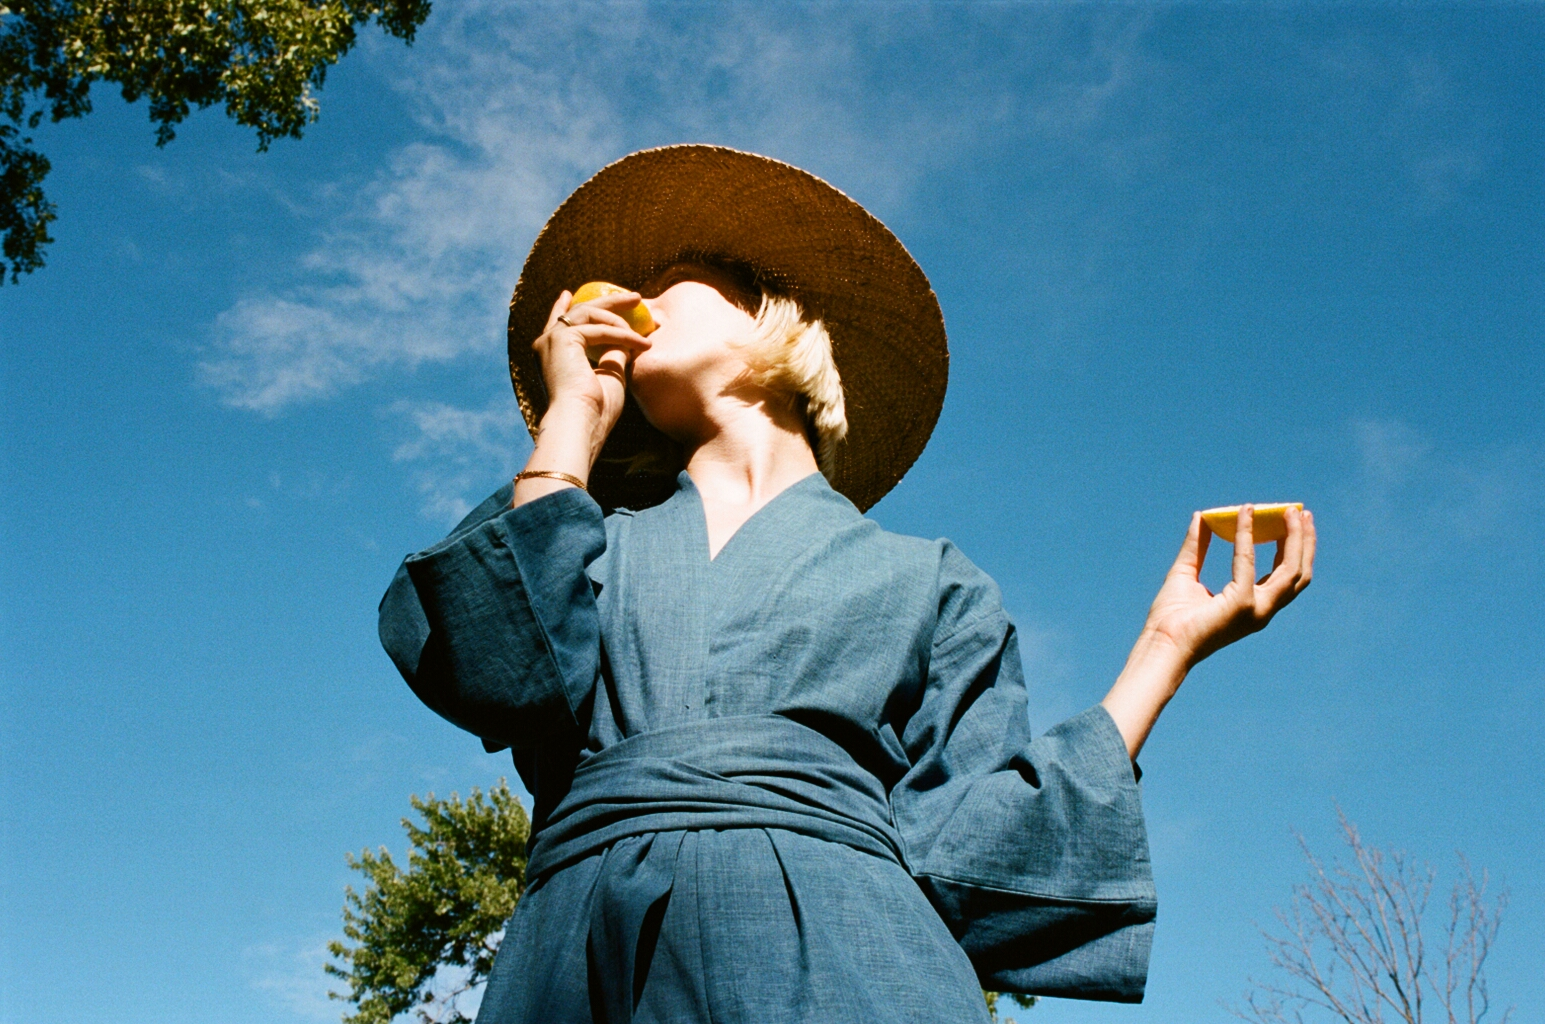 MOMO IS EATING A LEMON, A RISKY BEHAVIOR WHILE WEARING AN INDIGO ROBE...